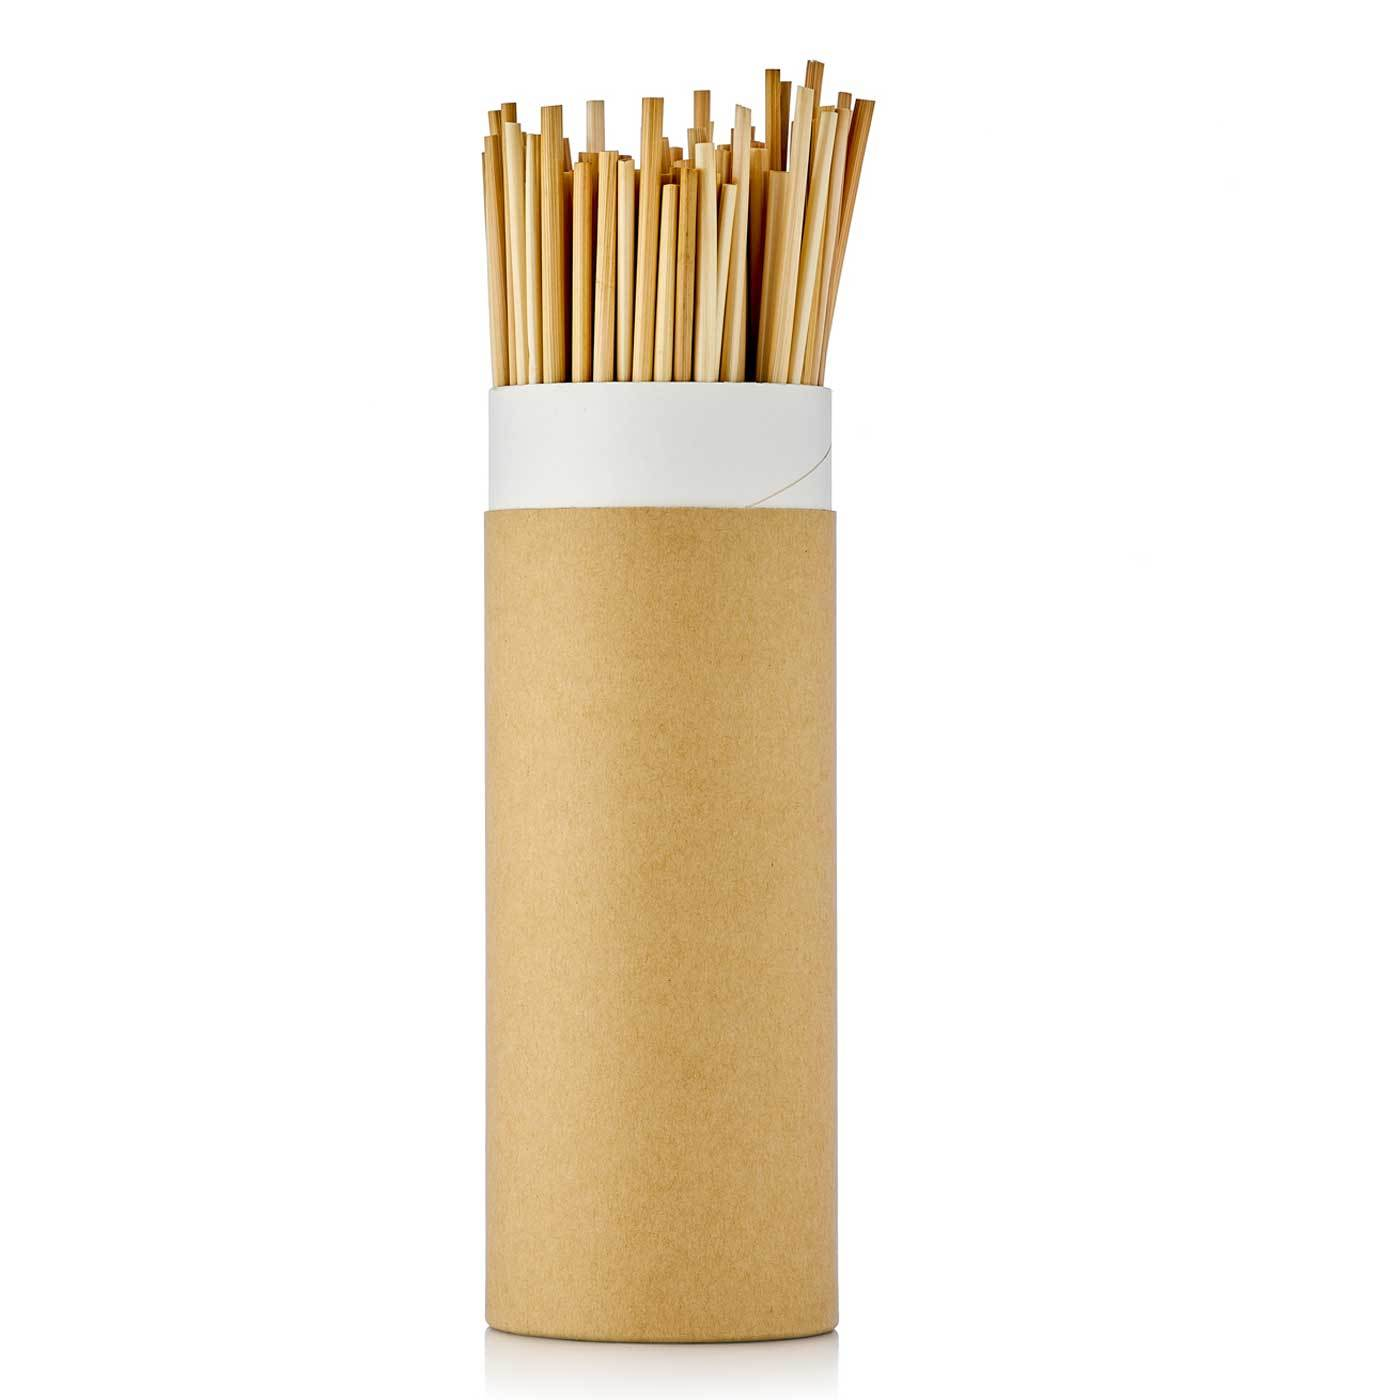 Аксессуары Пшеничная коктейльная трубочка 20 см в тубусе, упаковка на 100 шт. pshenichnie-trubochki-teastar.jpg